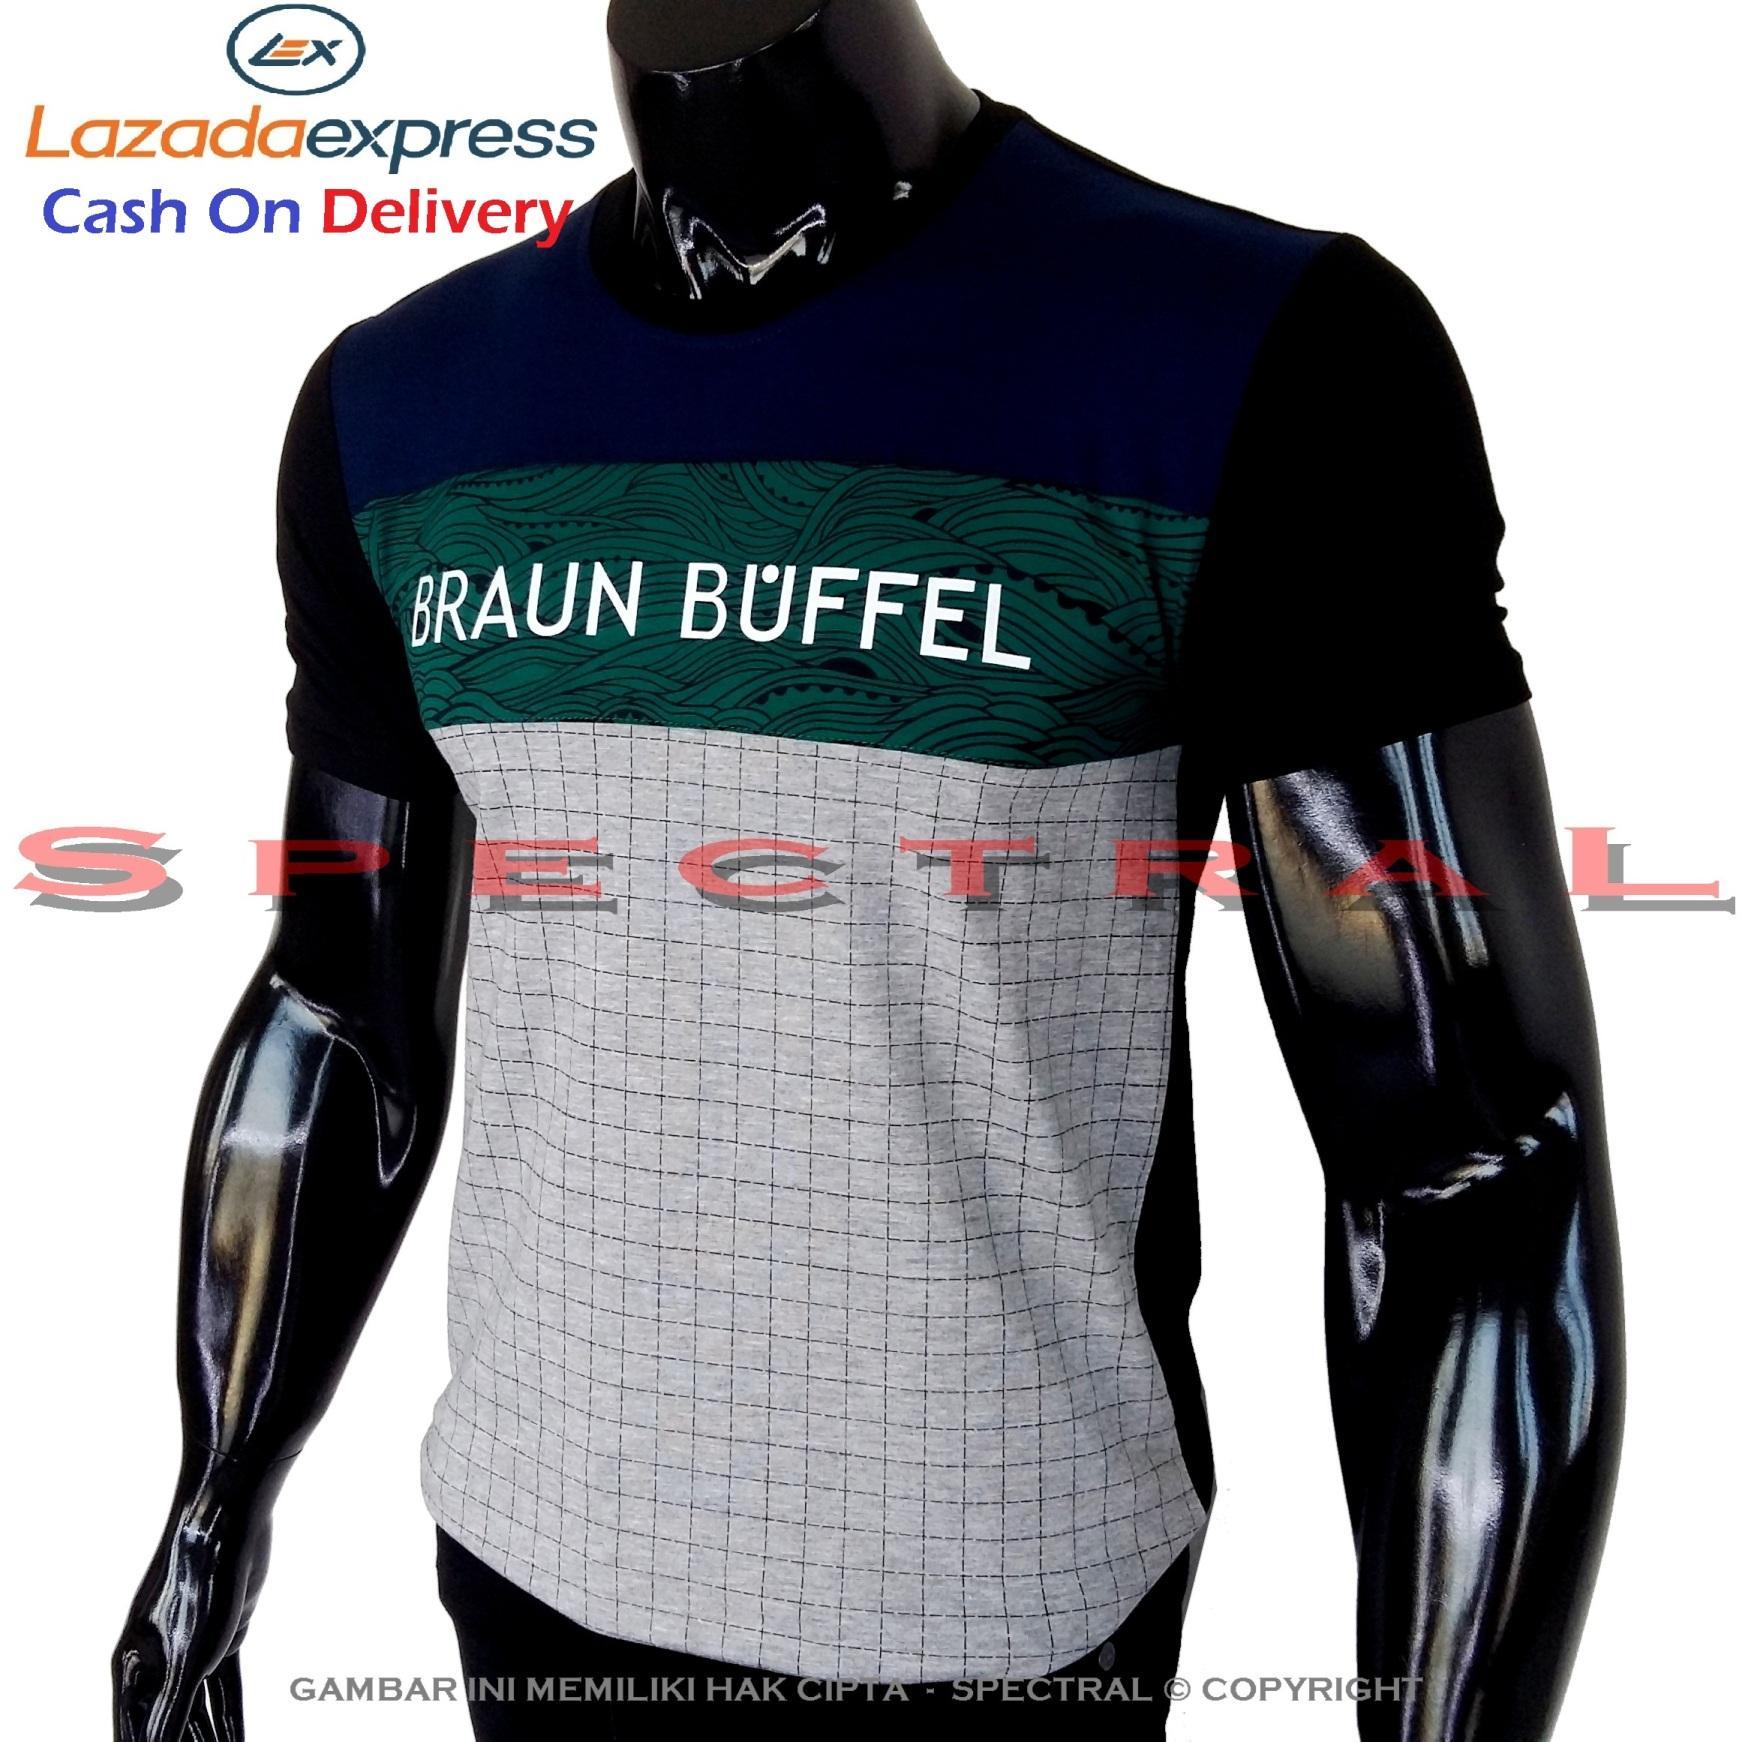 Spectral - Kaos Distro BRAUN BUFFEL Soft Rayon Viscose Lycra Pola M Fit To L Simple Fashionable Tid